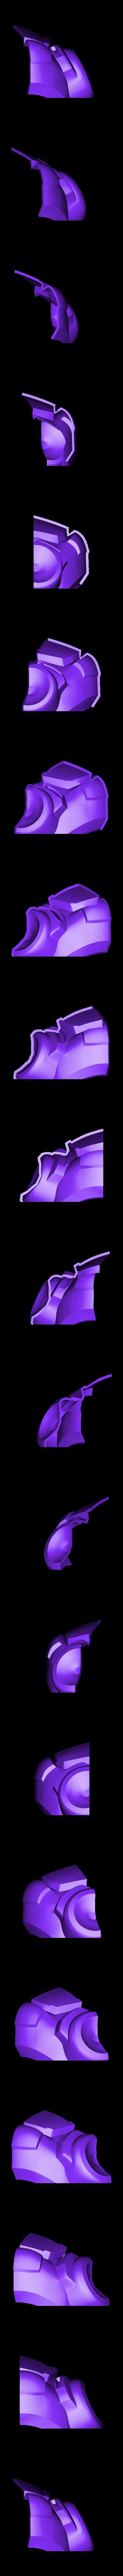 Part_8_v4.stl Download free STL file  Blood Dragon Helmet Mass Effect 2 (With Back Access) • 3D printable template, VillainousPropShop